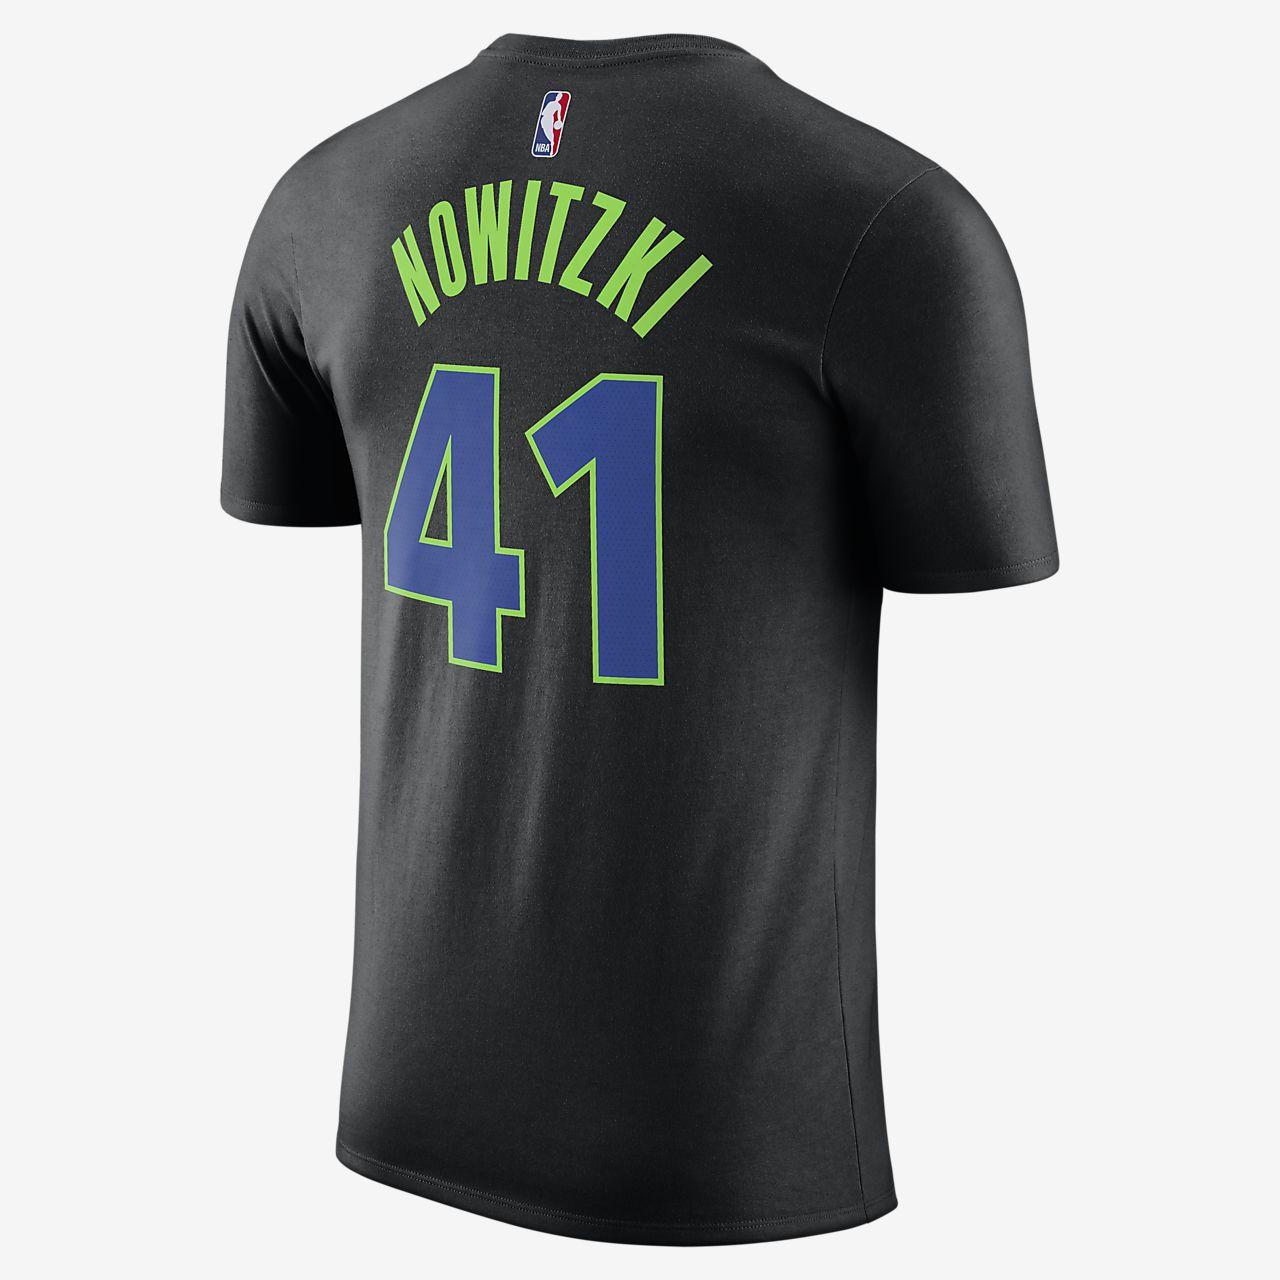 ... Dirk Nowitzki Dallas Mavericks City Edition Nike Dry Men's NBA T-Shirt